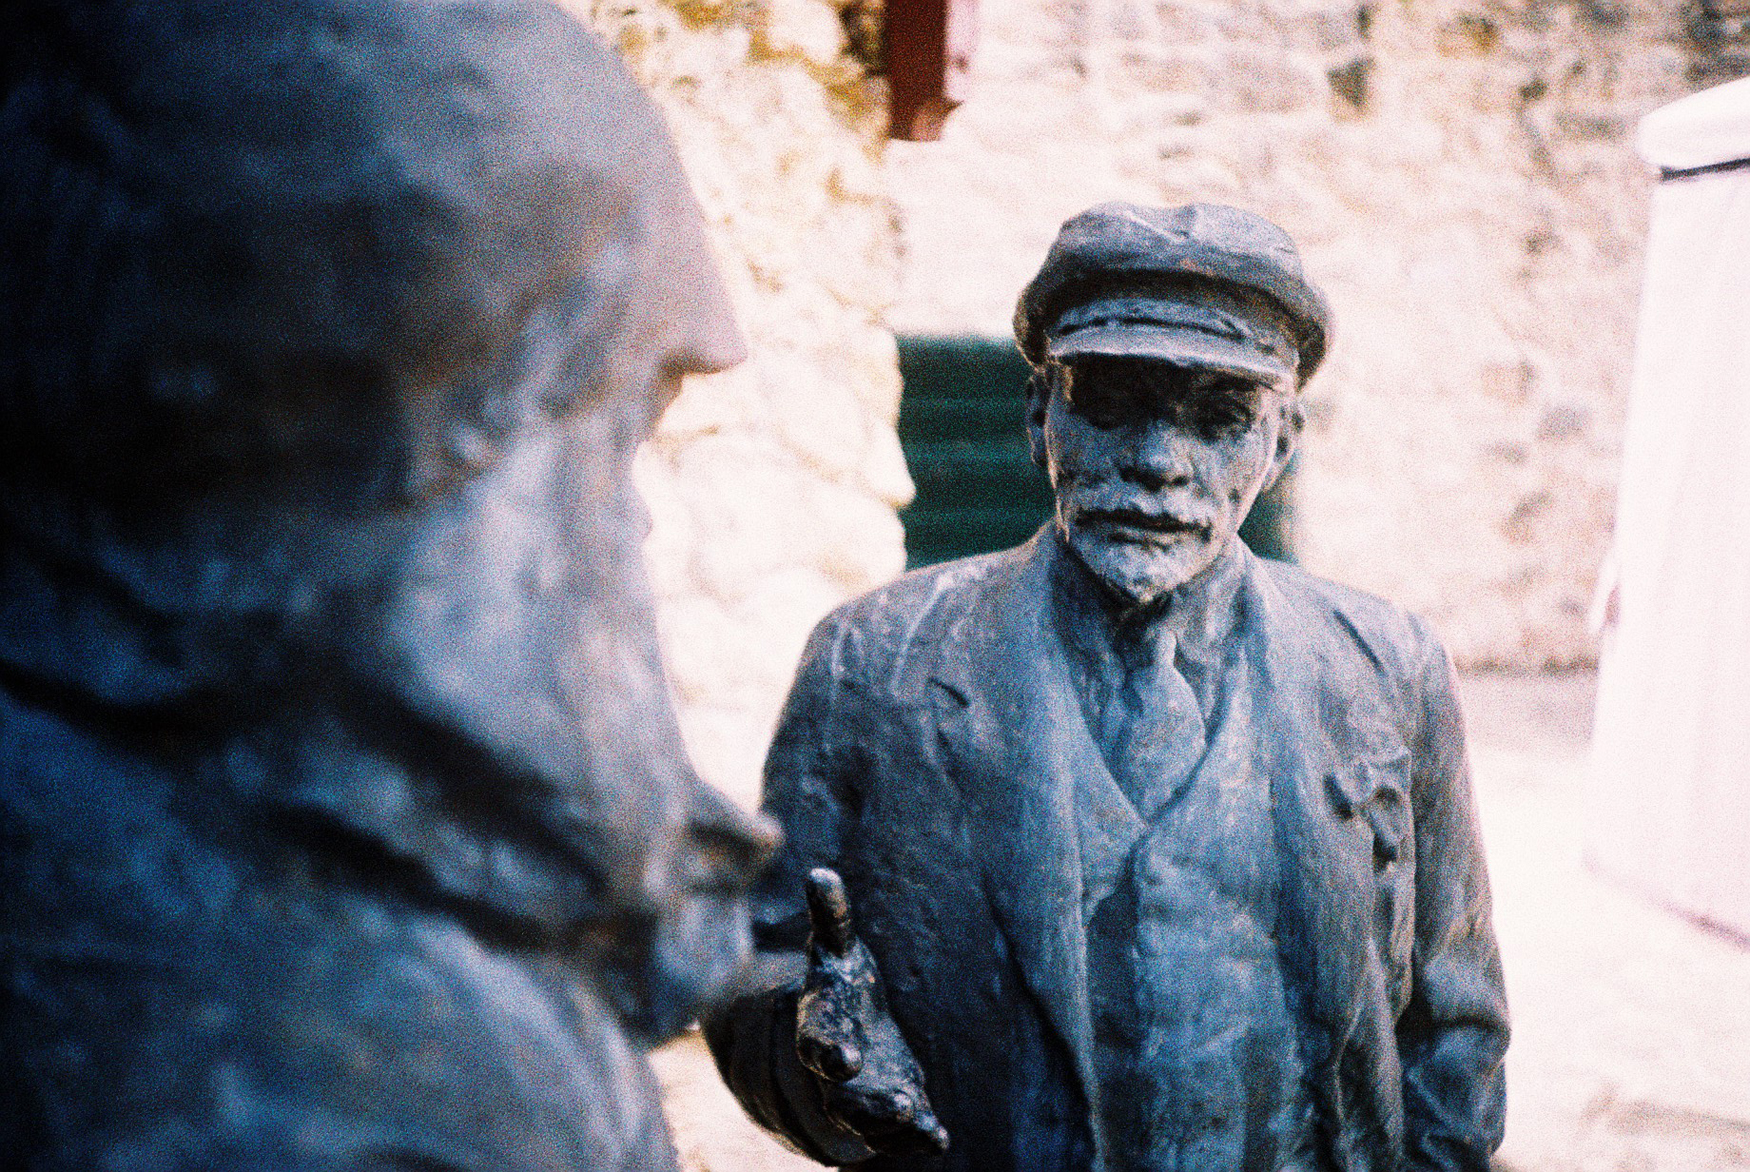 Lenin statue (Pic: Stephen Dowling)